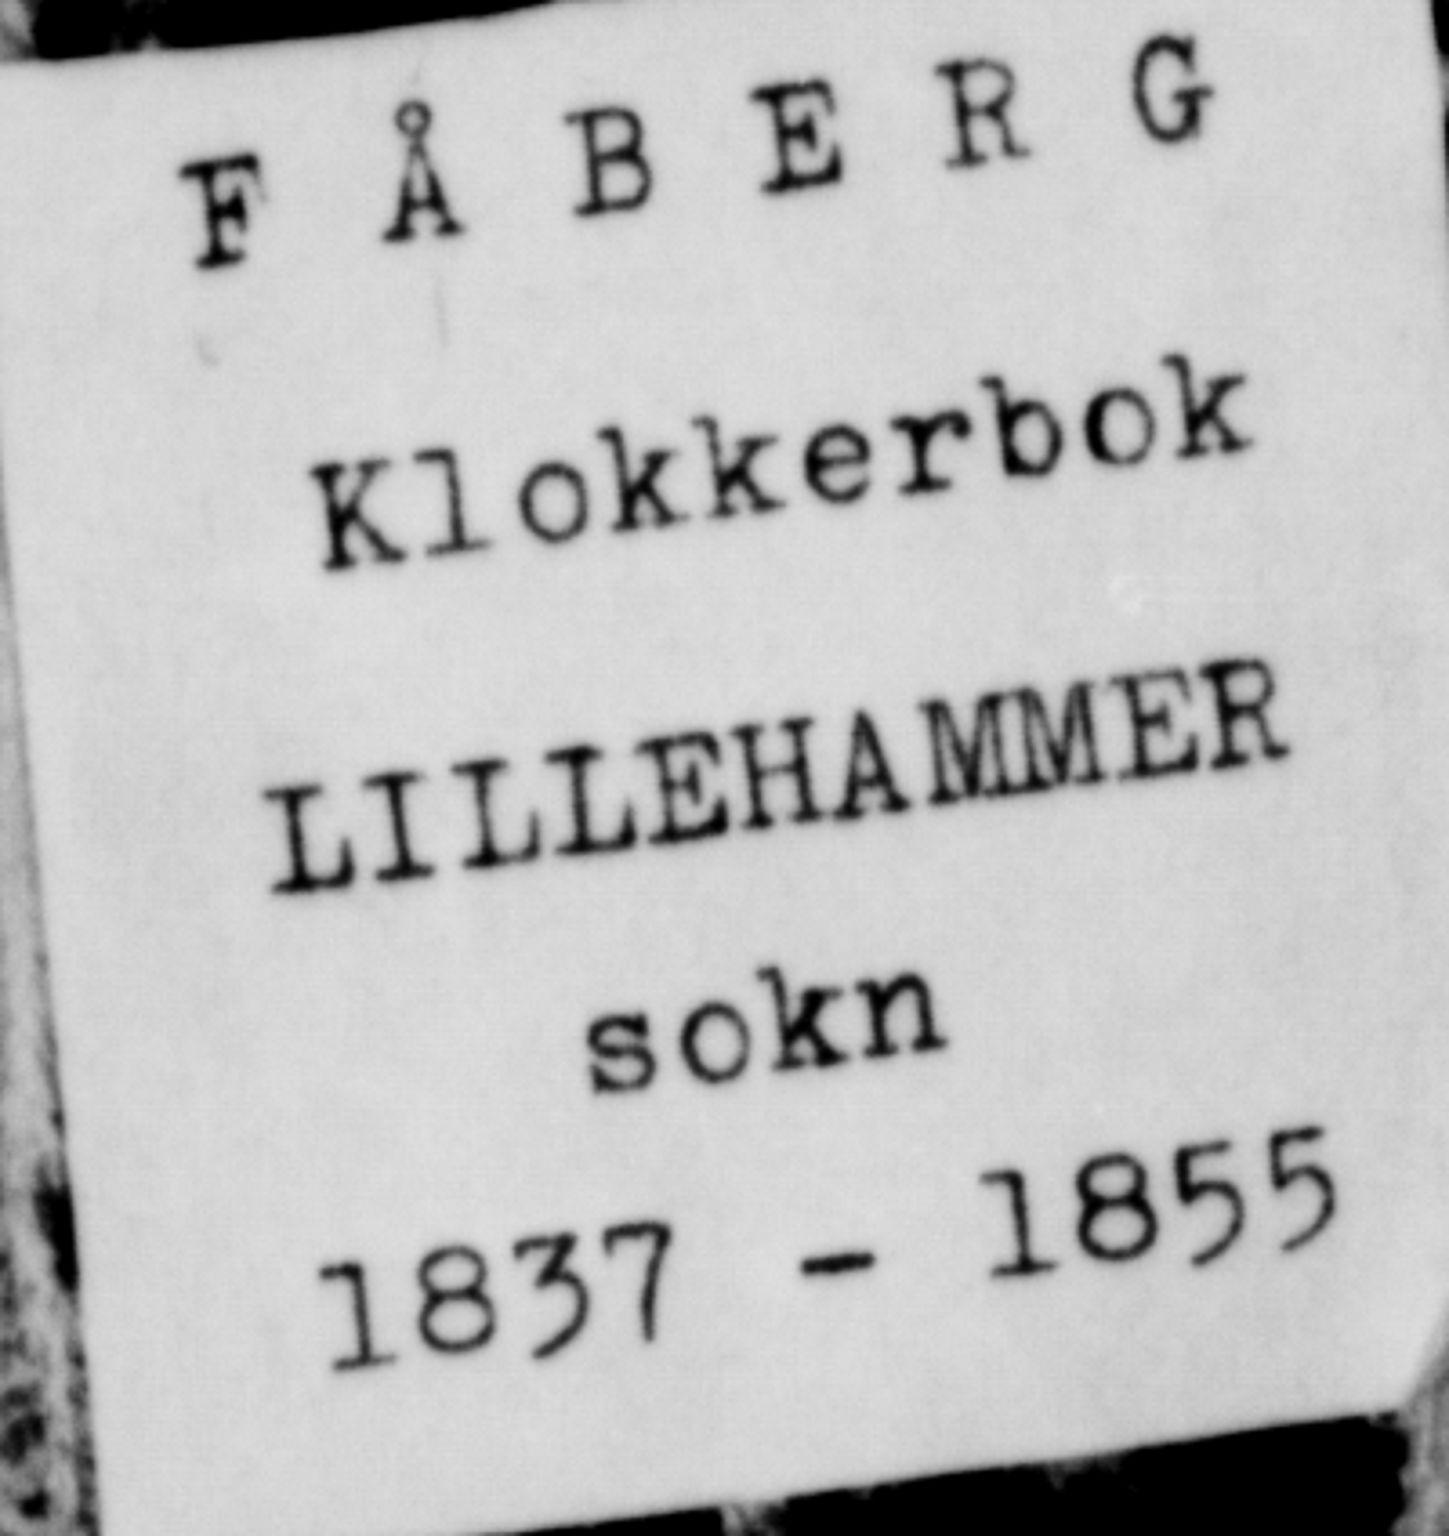 SAH, Fåberg prestekontor, H/Ha/Hab/L0006: Parish register (copy) no. 6, 1837-1855